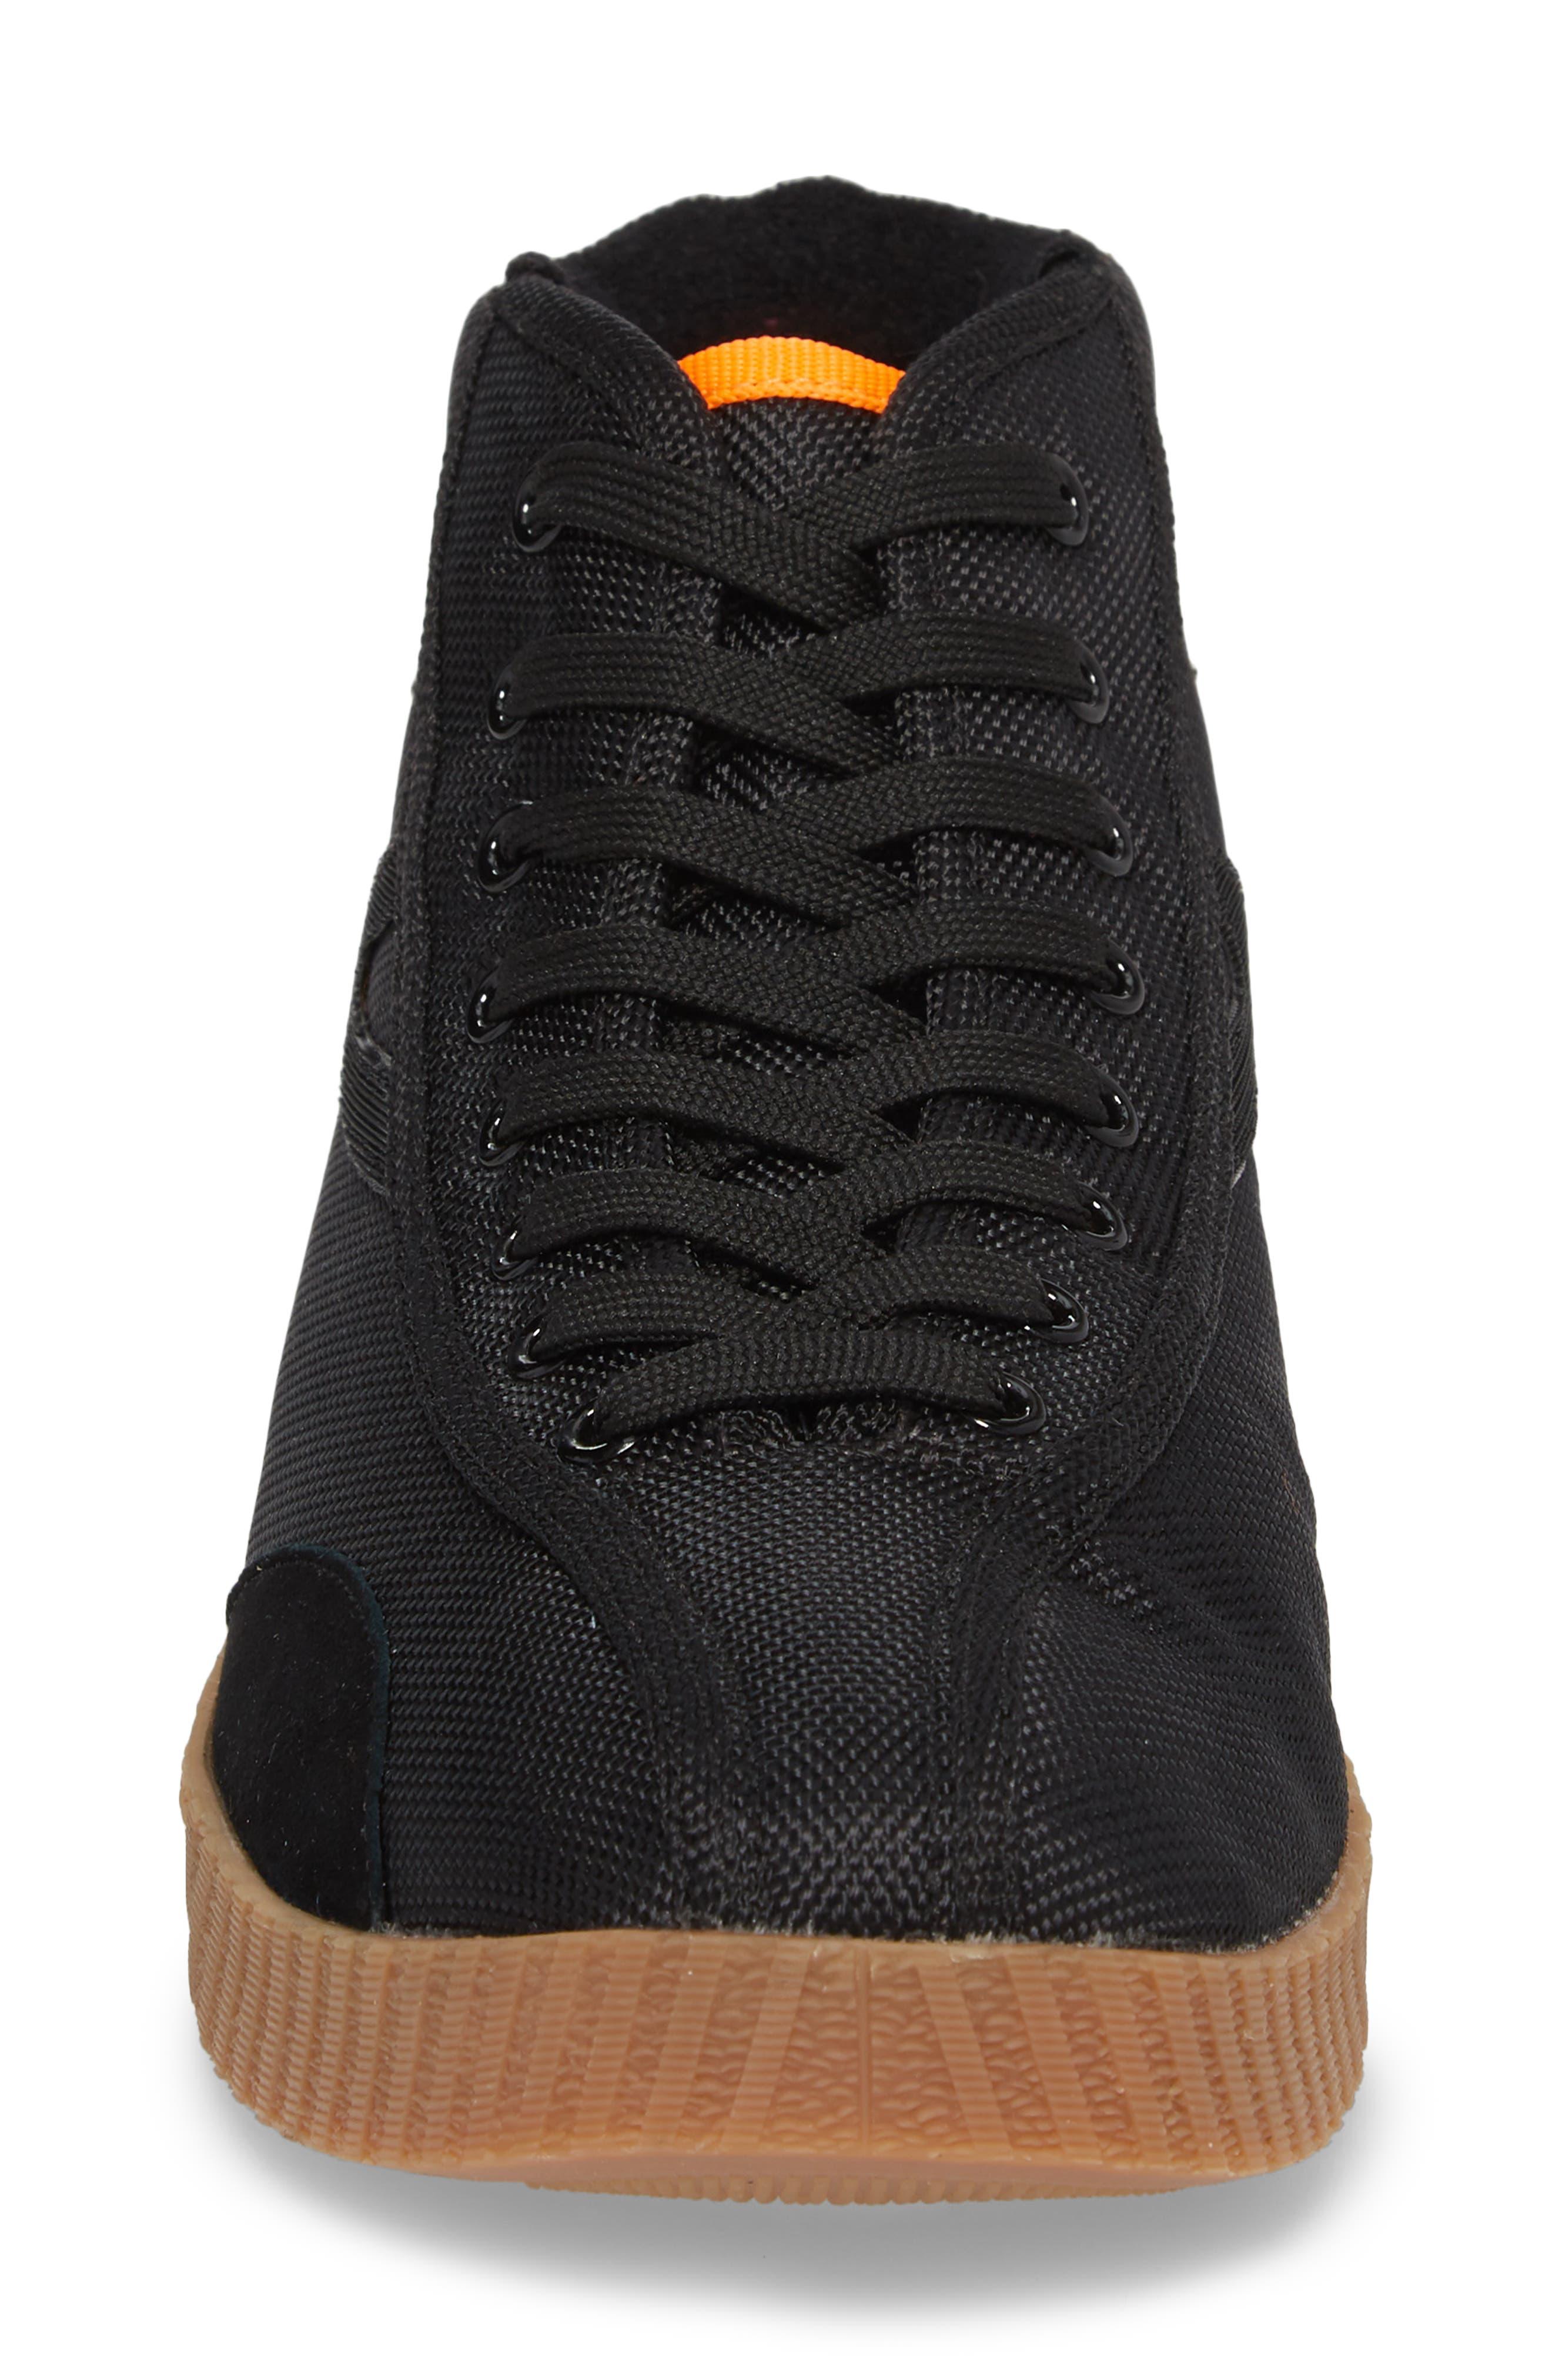 Andre 3000 Nylite High Top Sneaker,                             Alternate thumbnail 4, color,                             BLACK/ NEON ORANGE NYLON